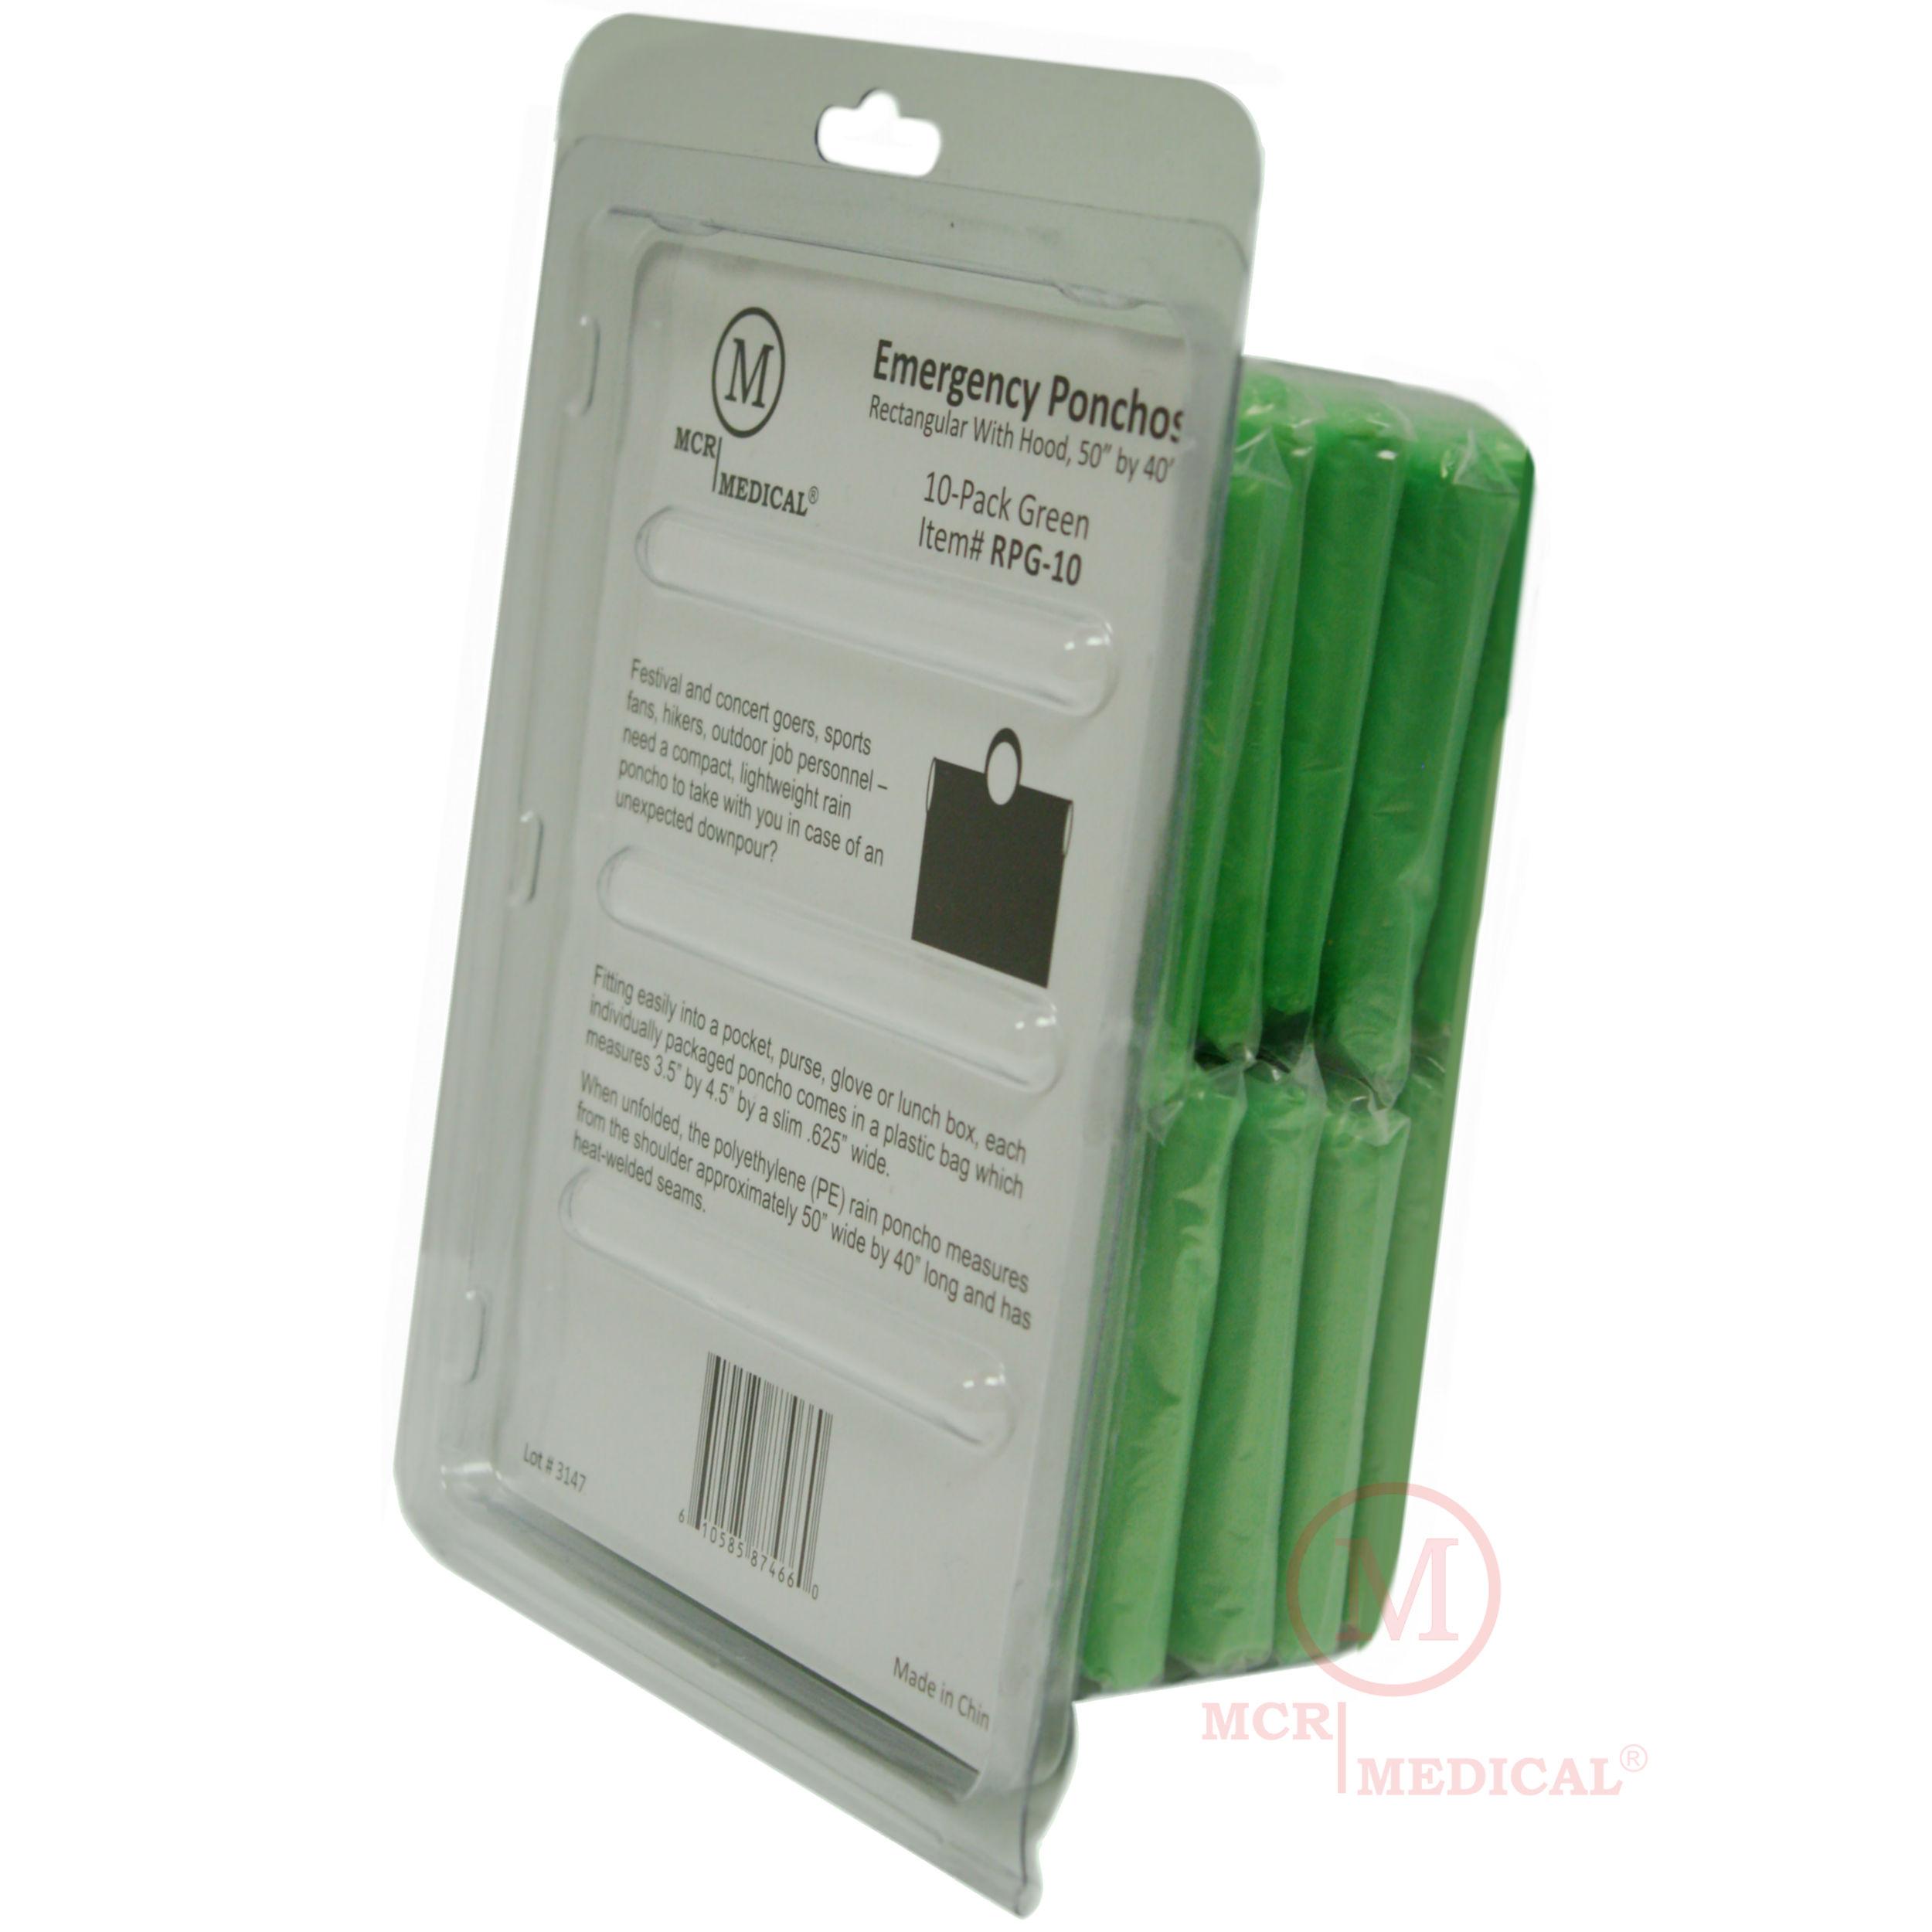 grabngo emergency rain poncho rectangular with hood mcr medical supply